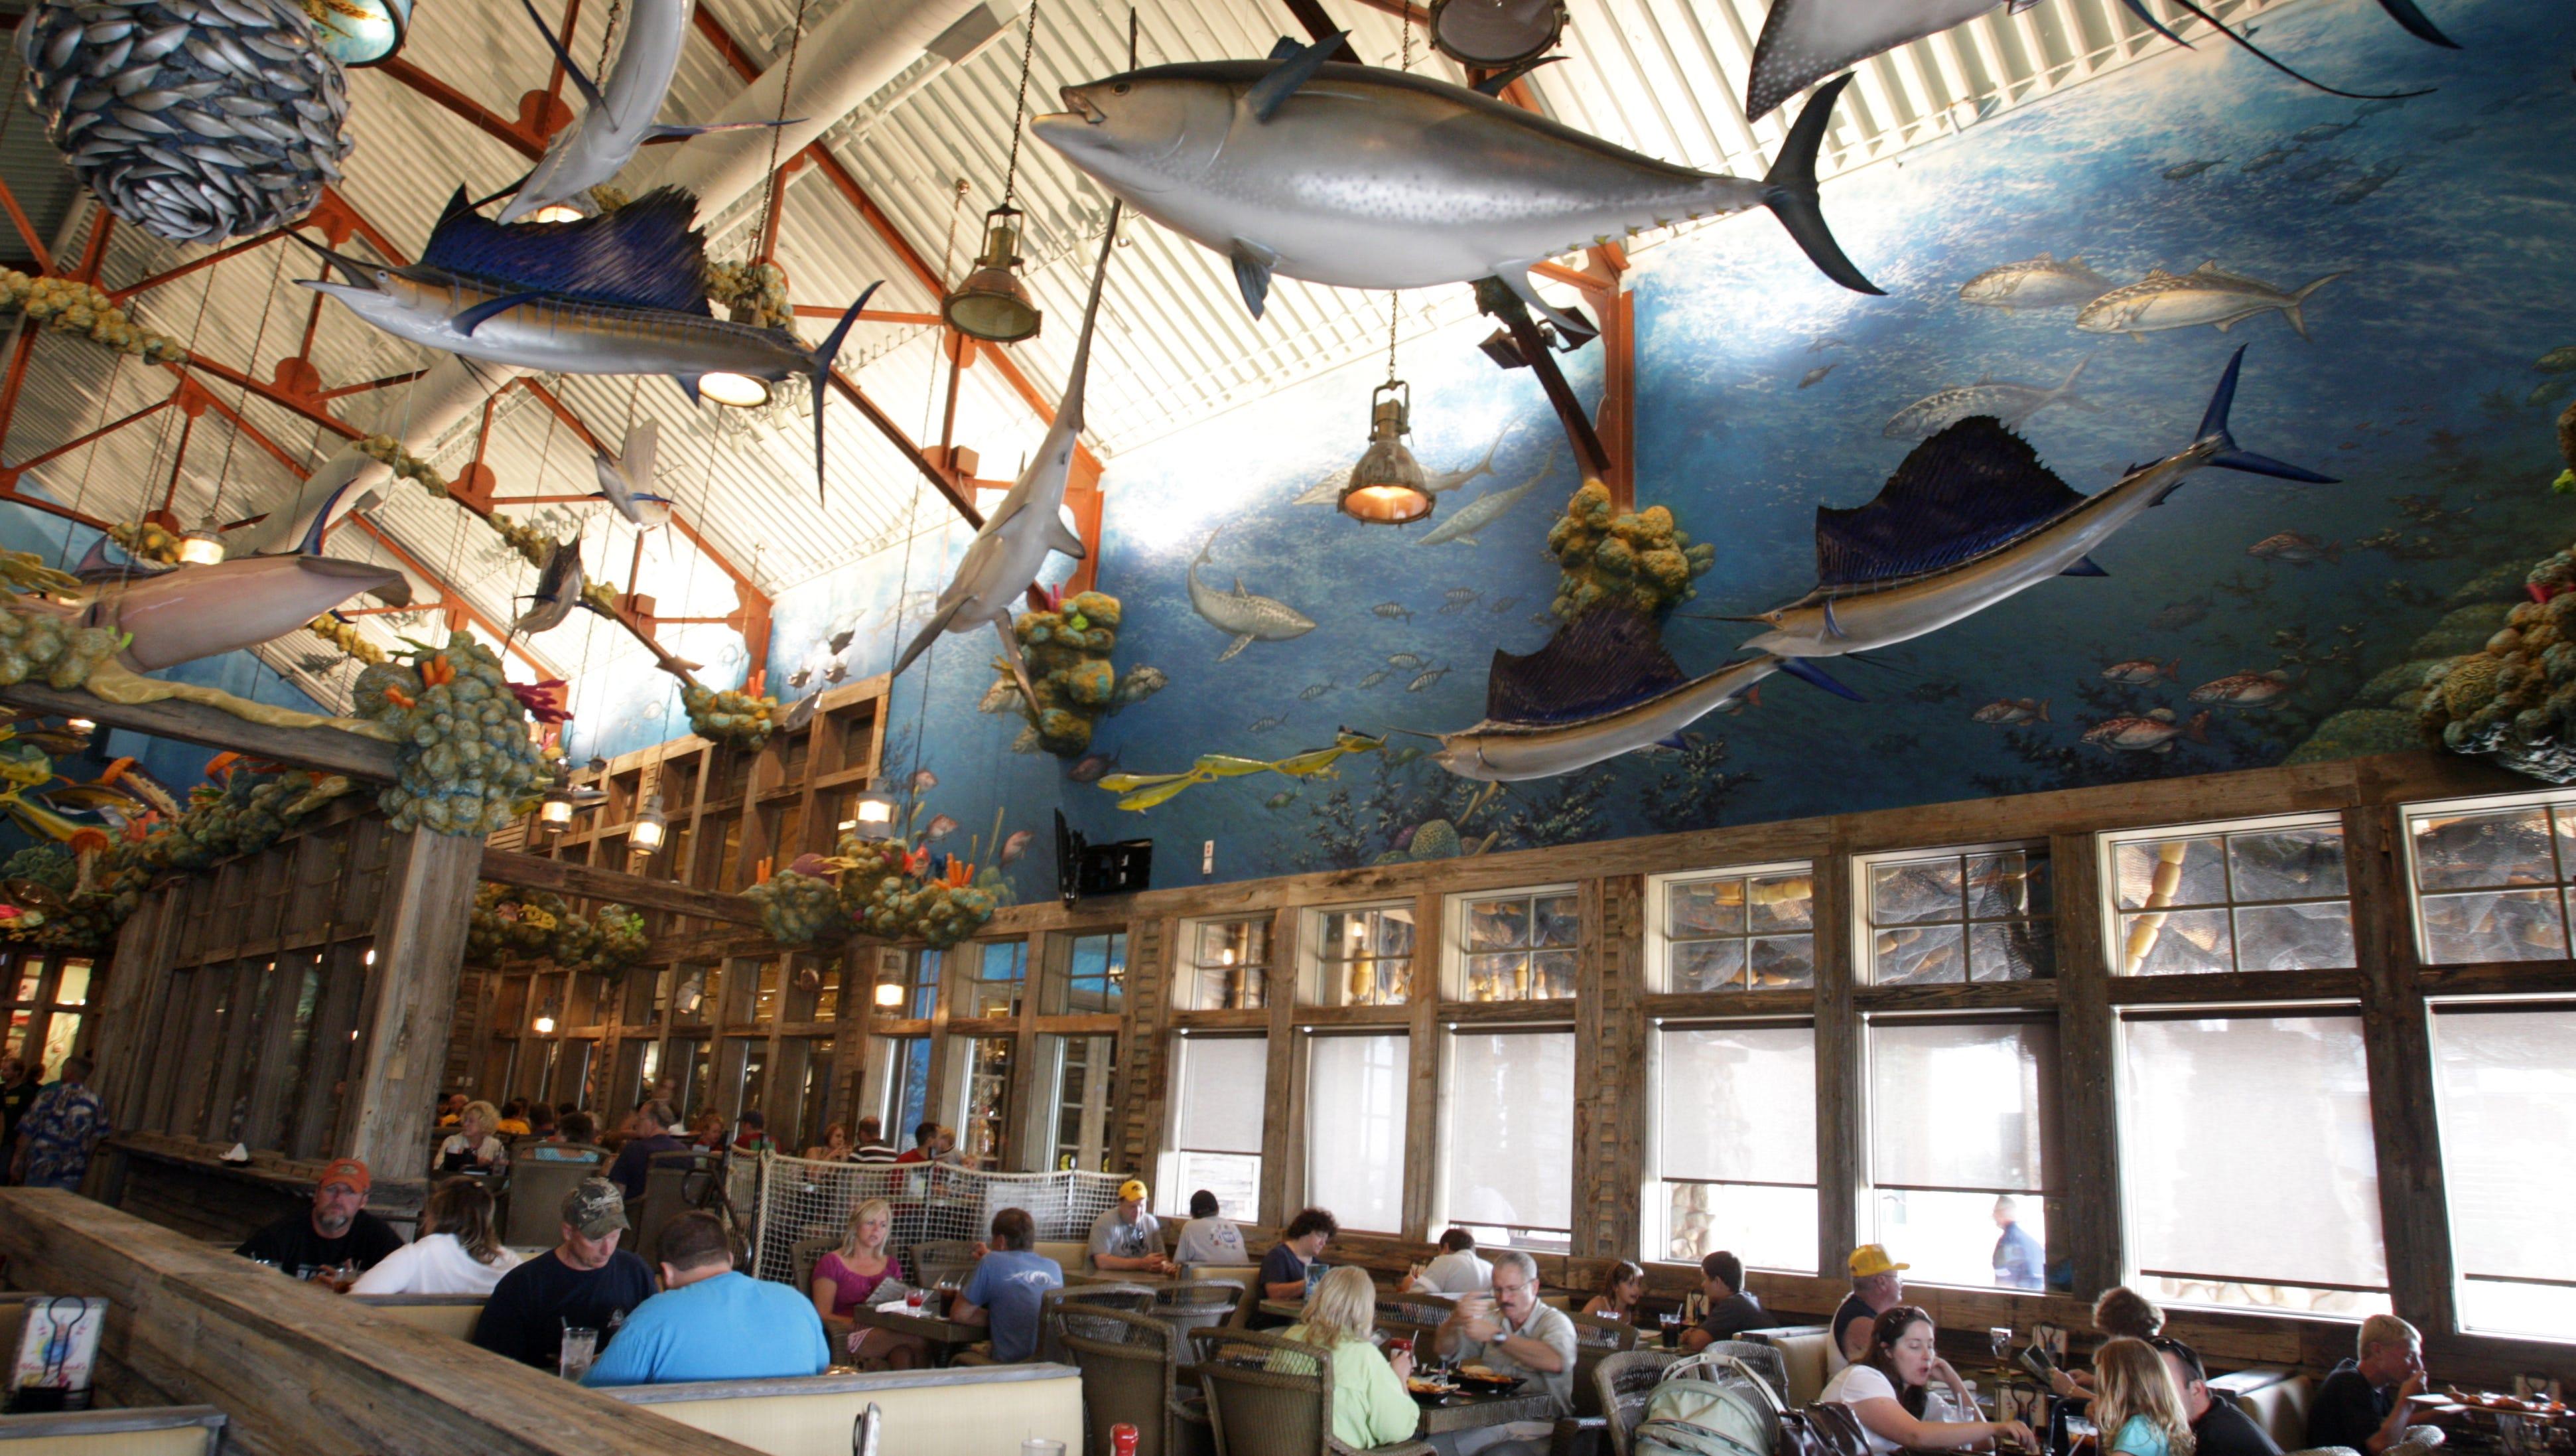 Fishing Camping Bowling And More